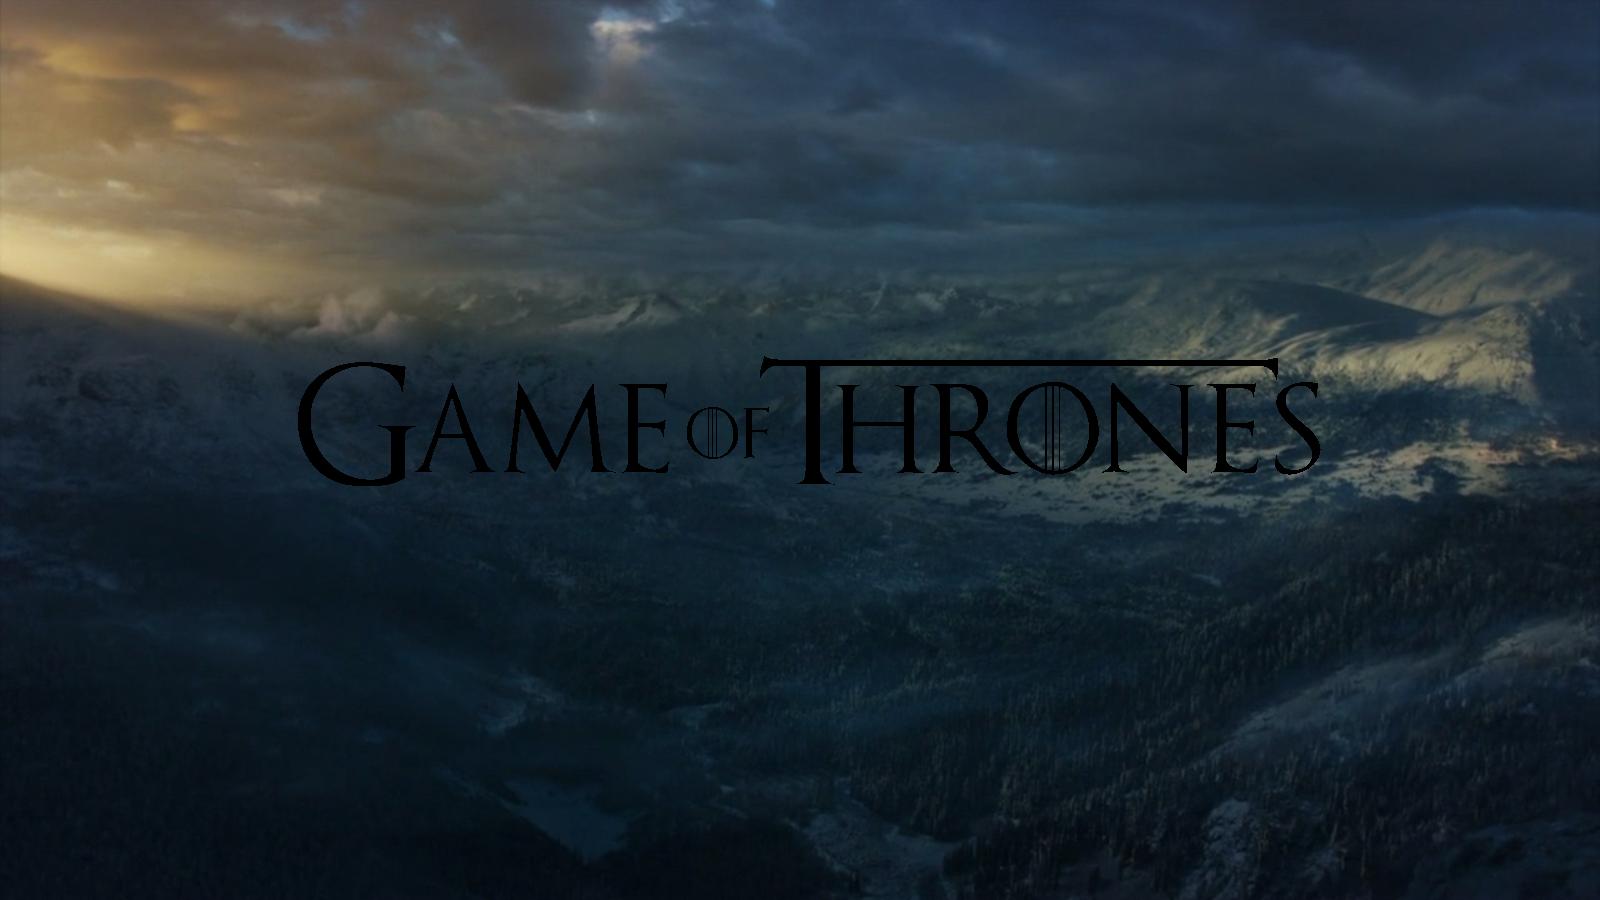 Le Trone De Fer Game Of Thrones Fonds D Ecran Arrieres Plan 1600x900 Id 401649 Game Of Thrones Fond Ecran Arriere Plan